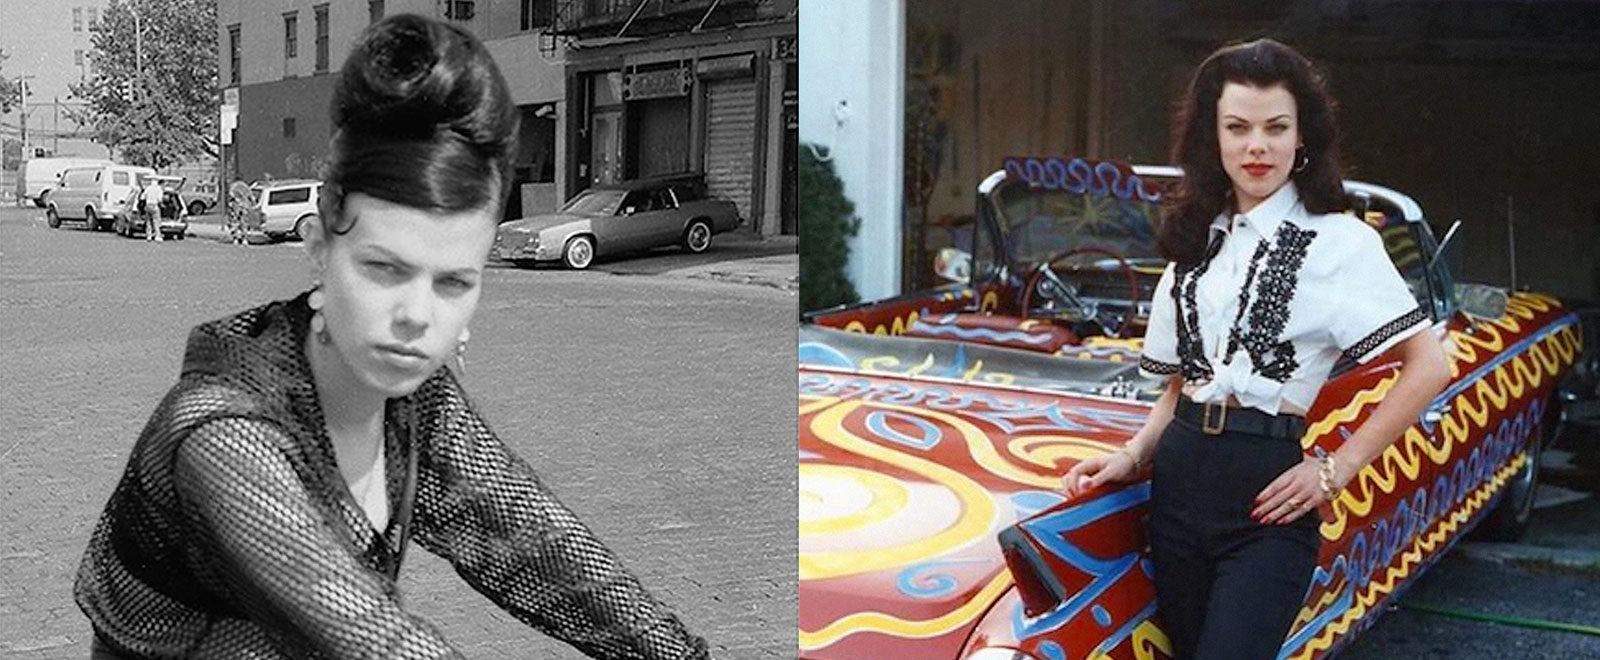 Debi Mazar New York Actress Interview Richard Boch Covid GrandLife